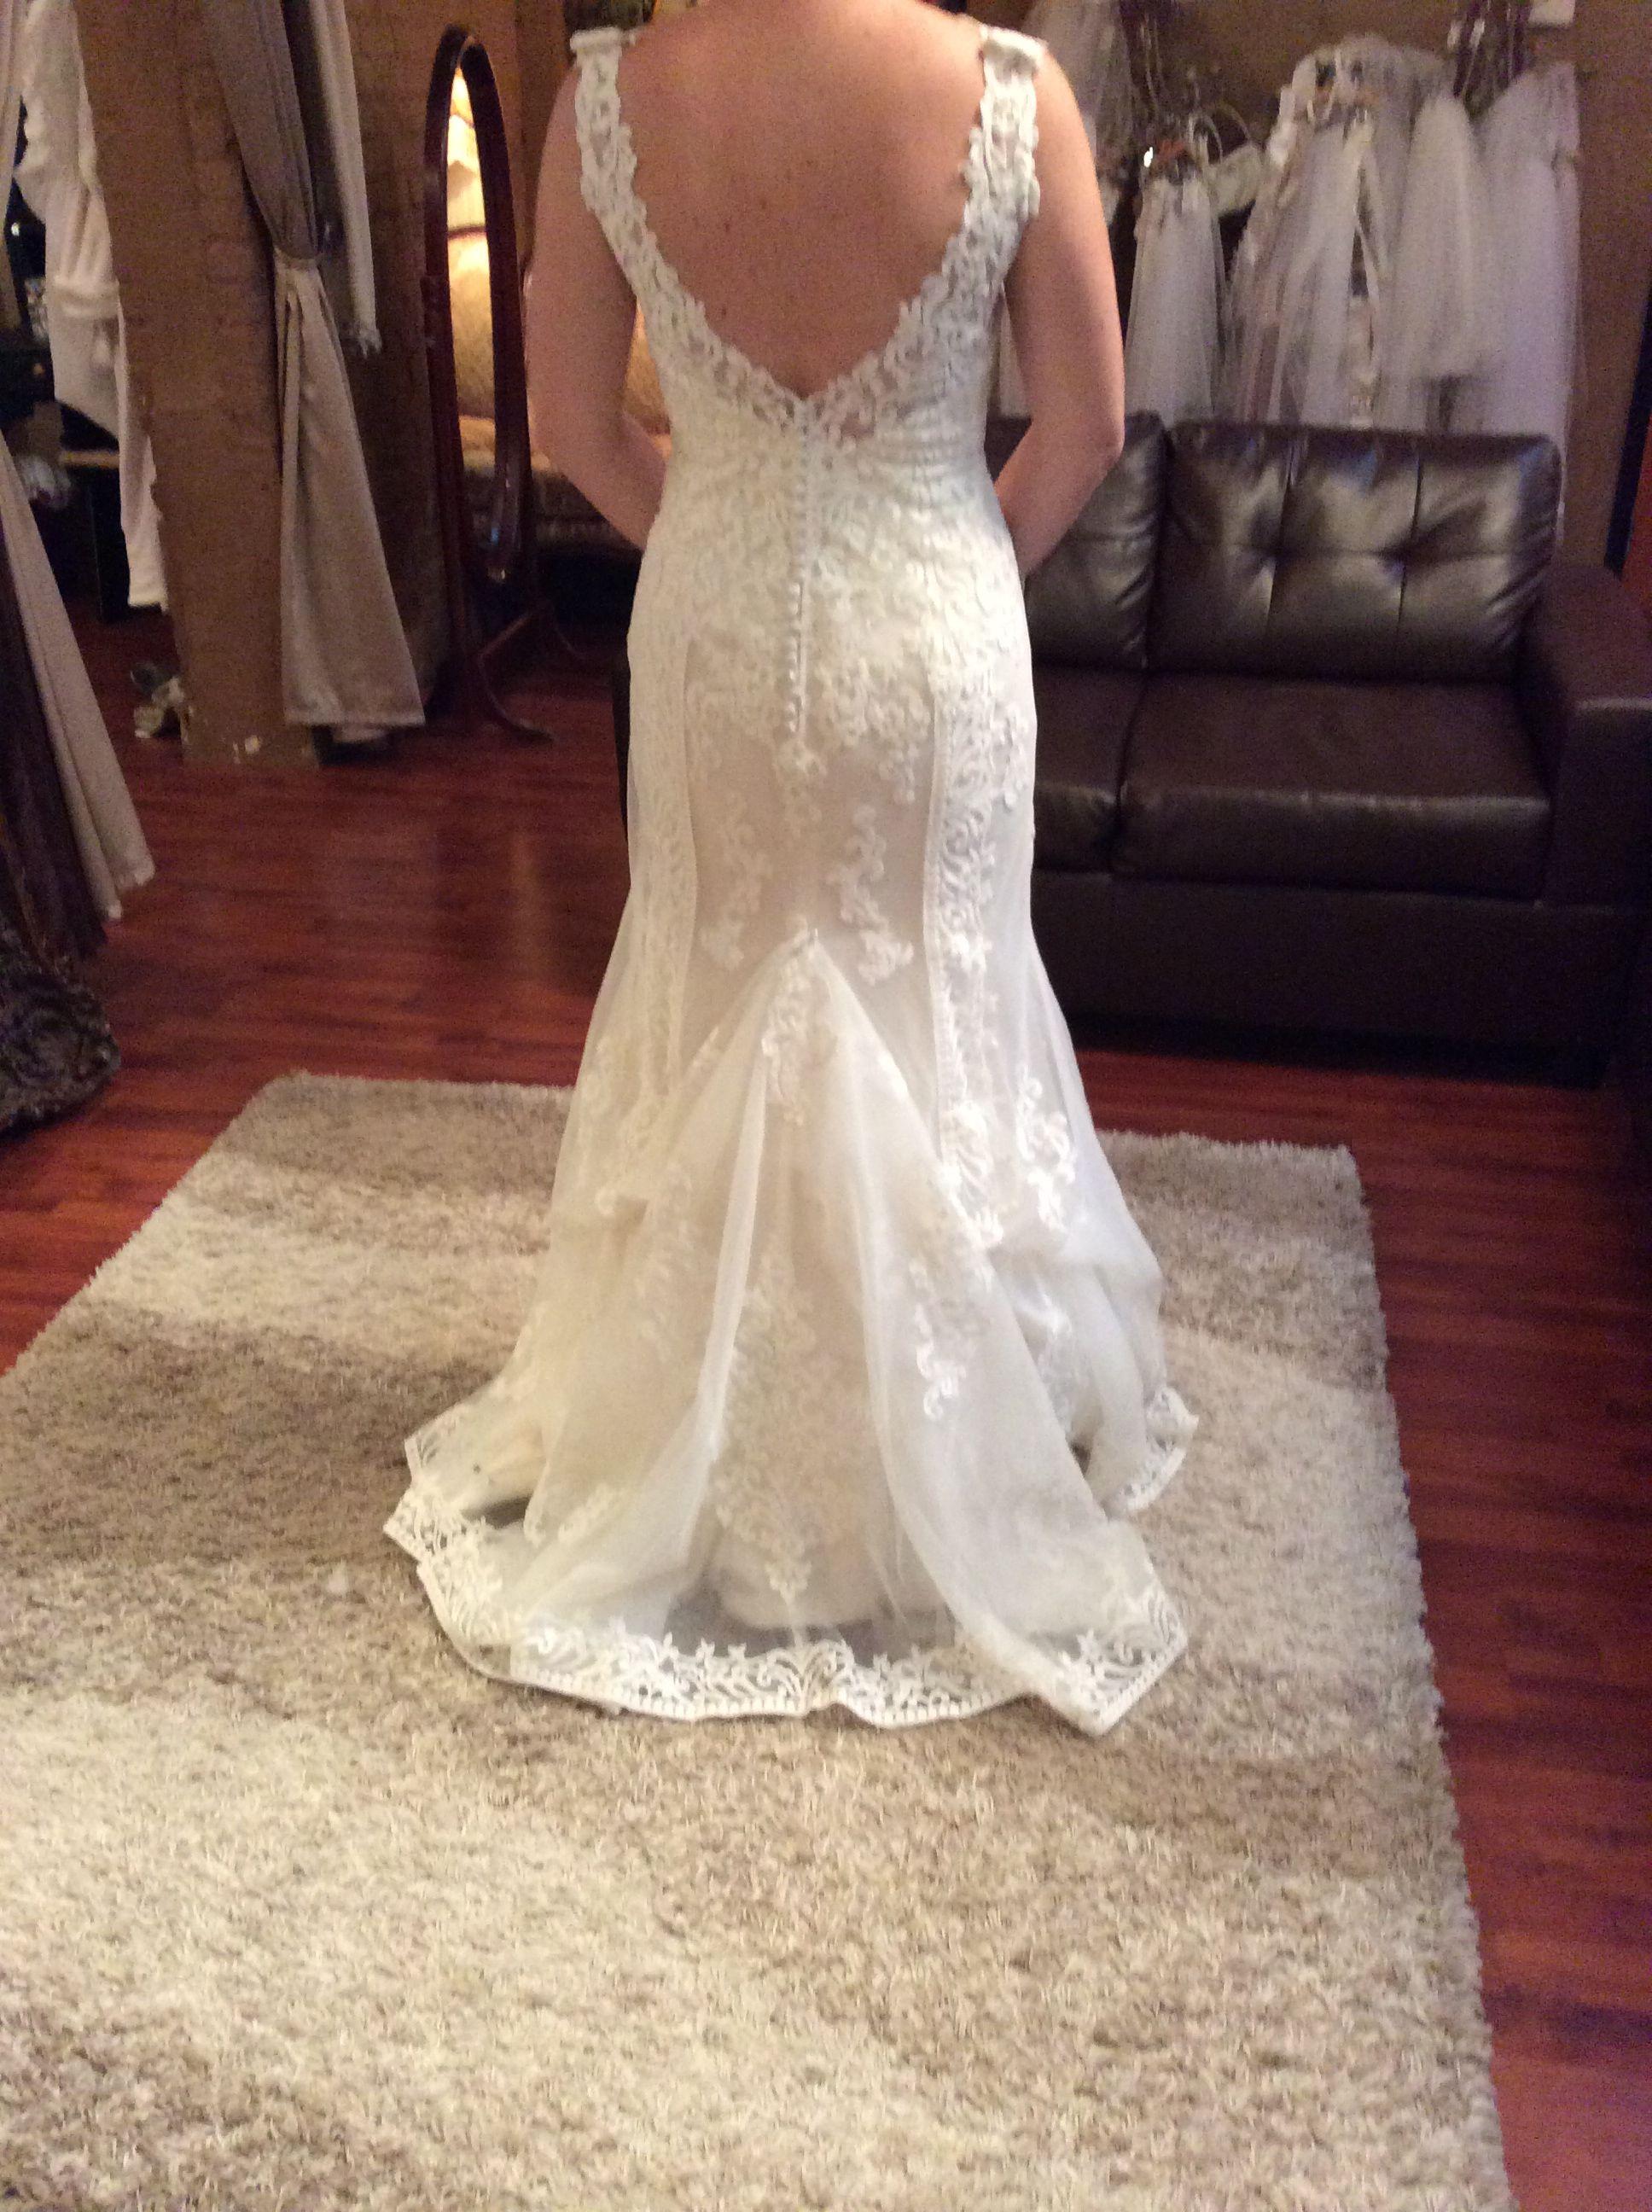 Over bustle | Wedding Gown Bustle Styles | Pinterest | Bustle ...